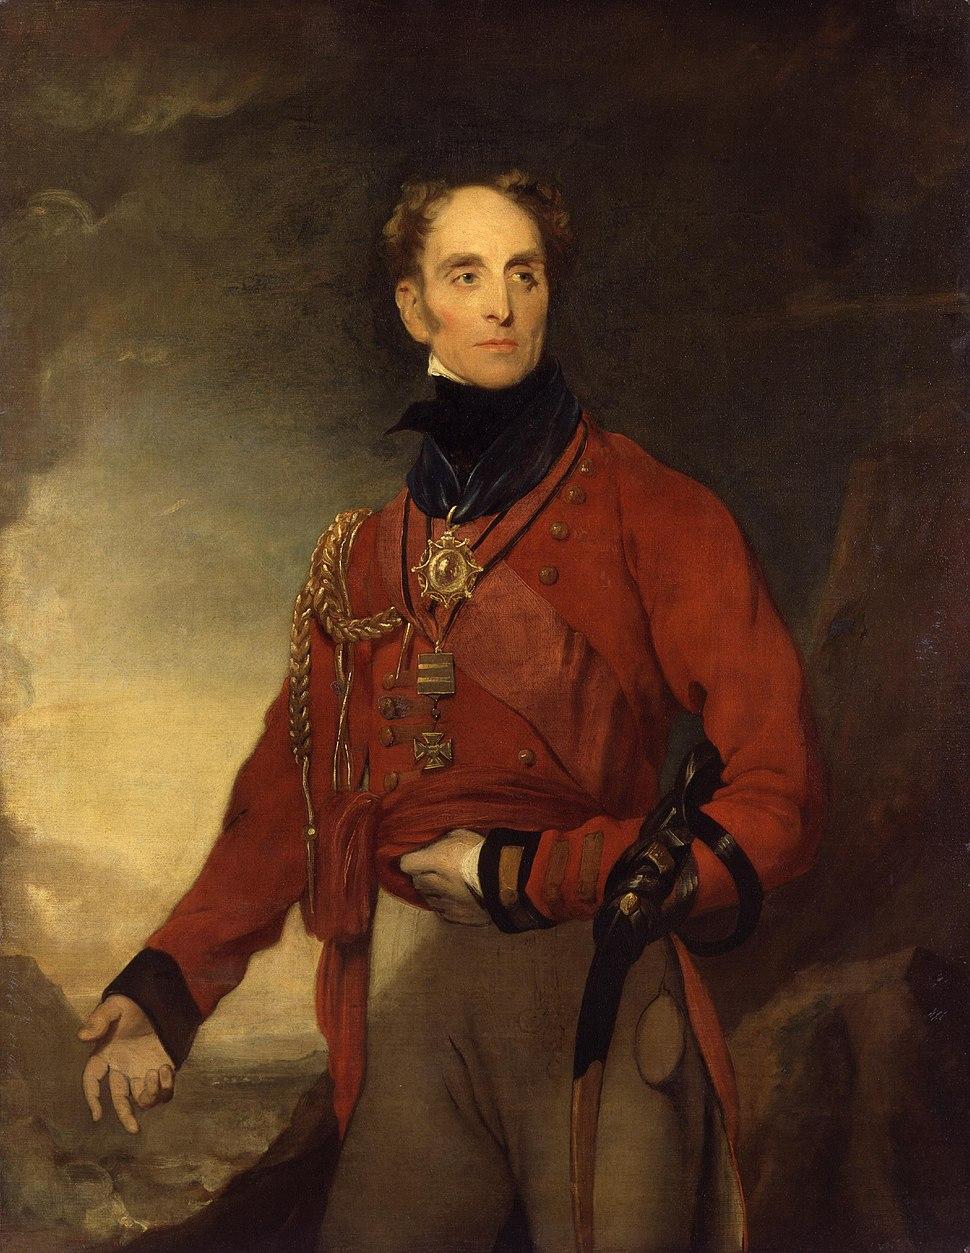 Sir Galbraith Lowry Cole by William Dyce